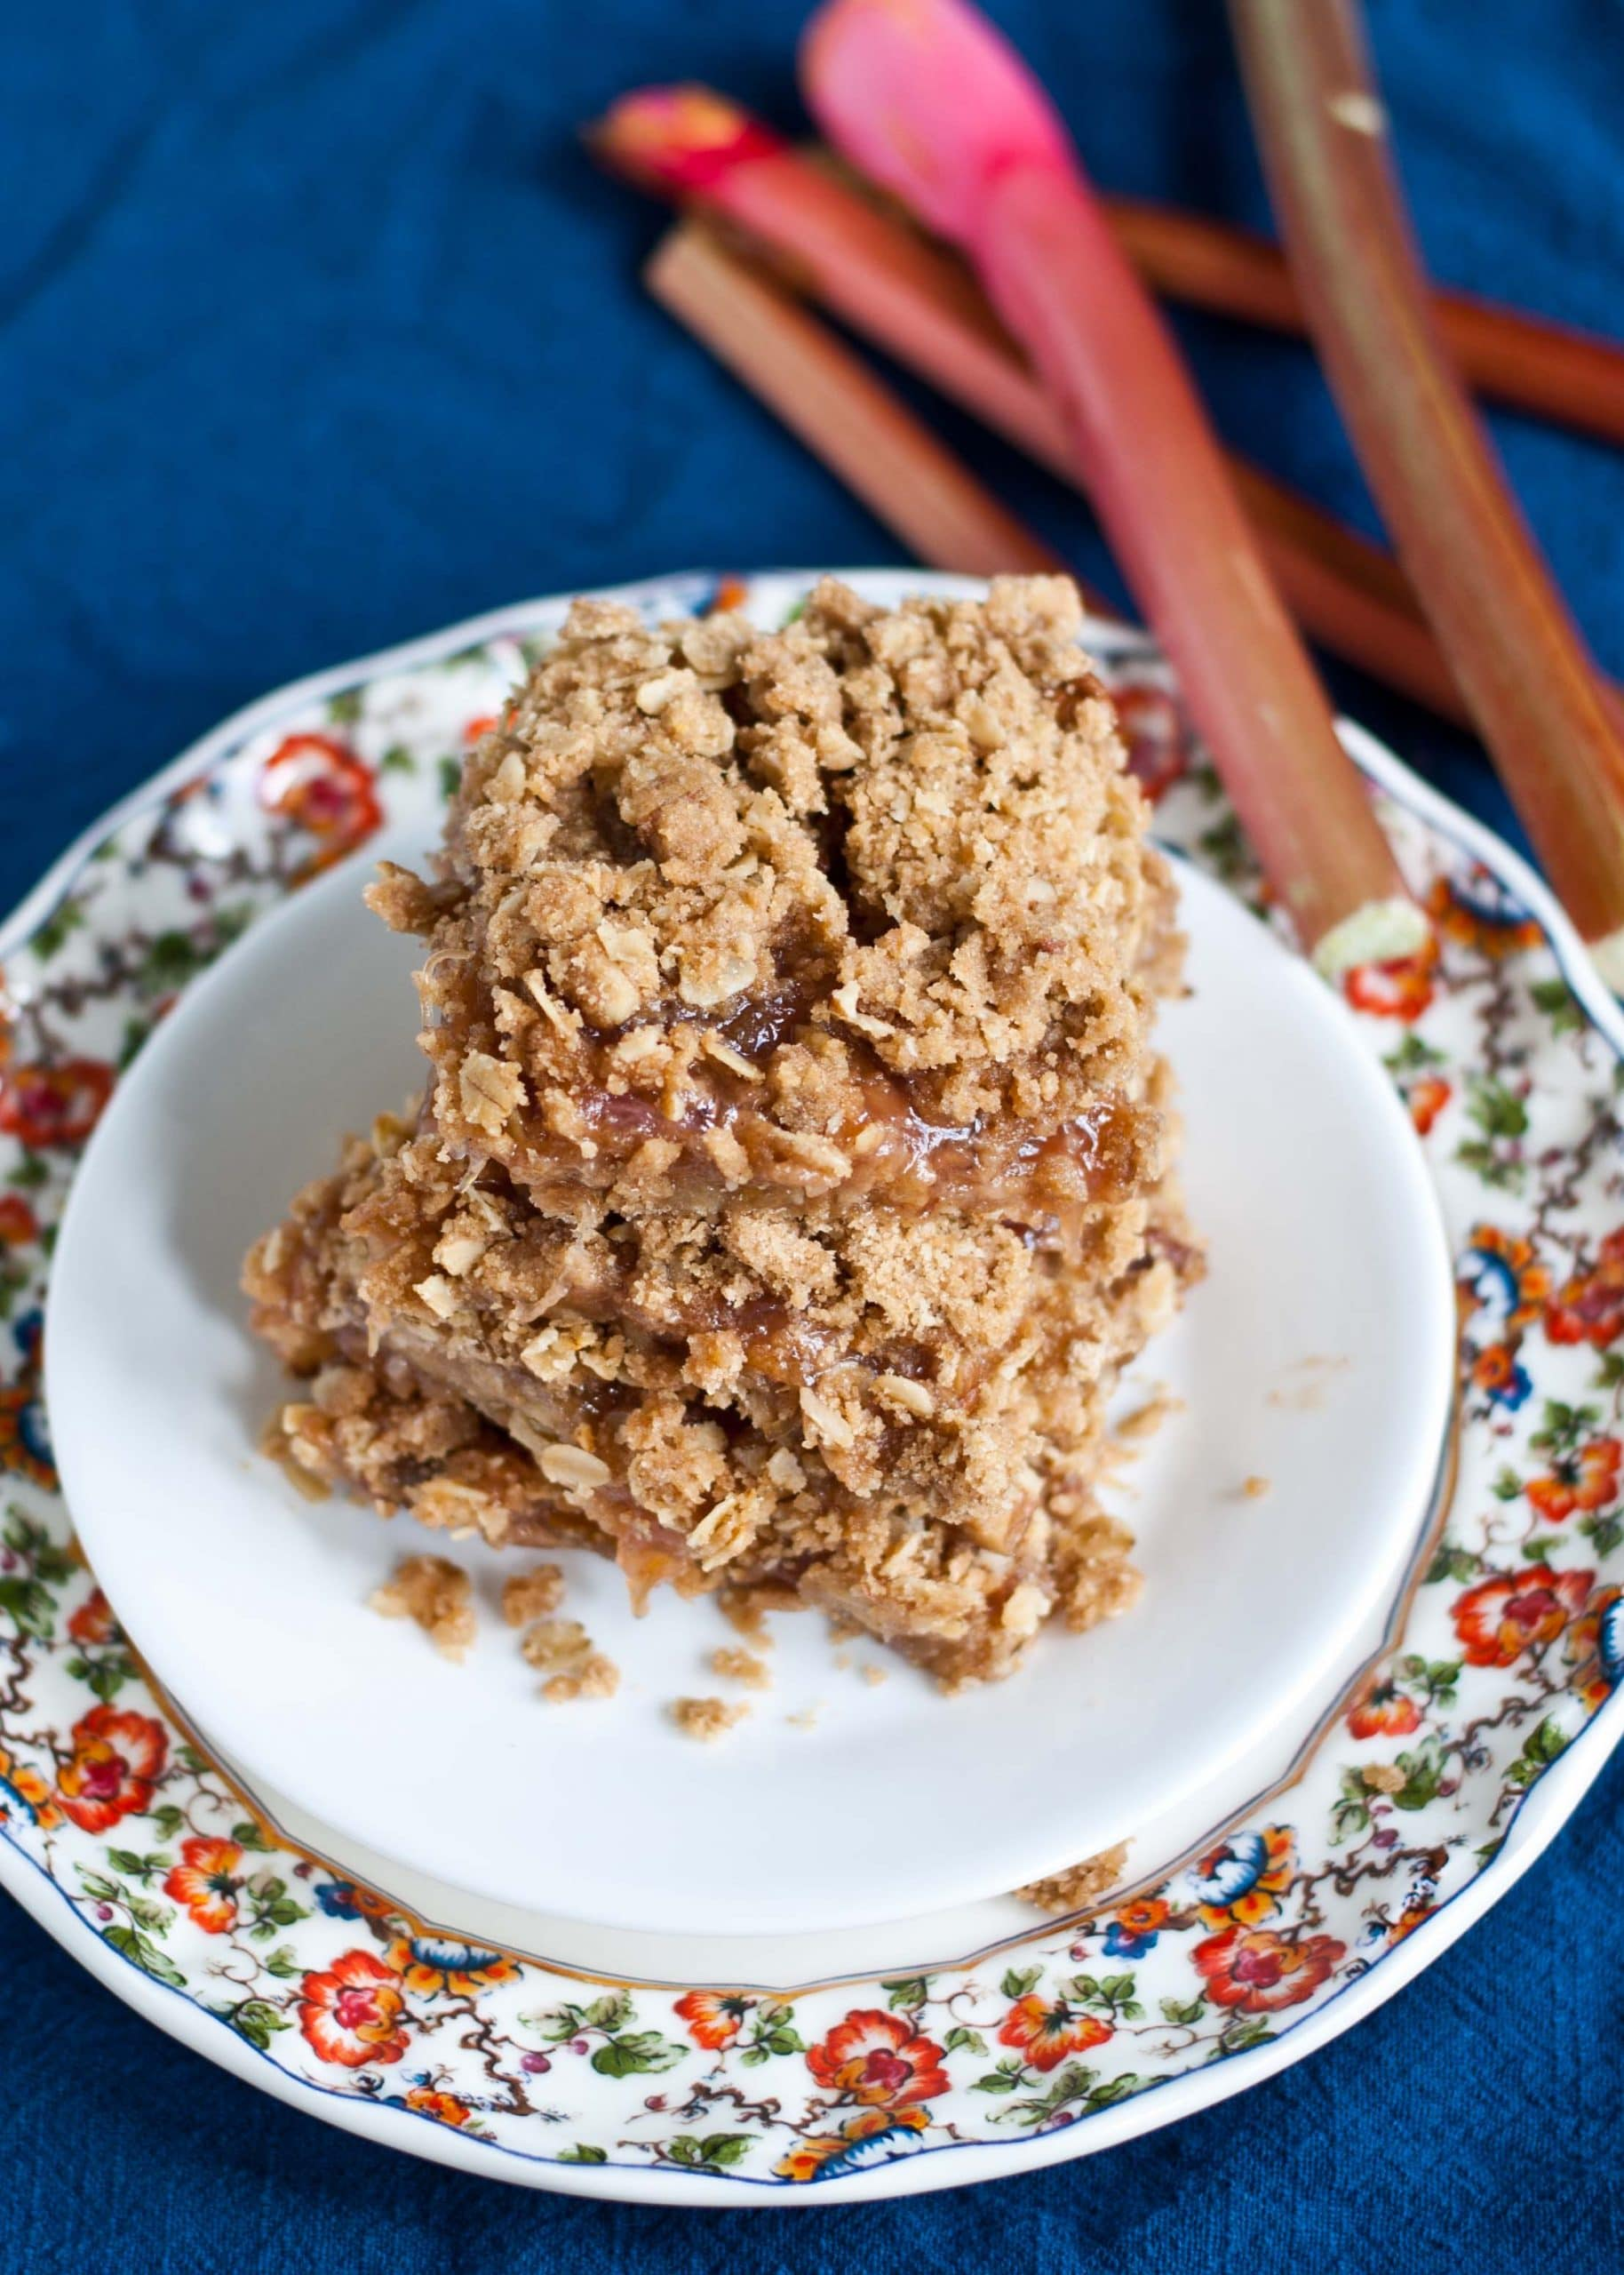 Oatmeal Rhubarb Crumble Bars | Neighborfoodblog.com